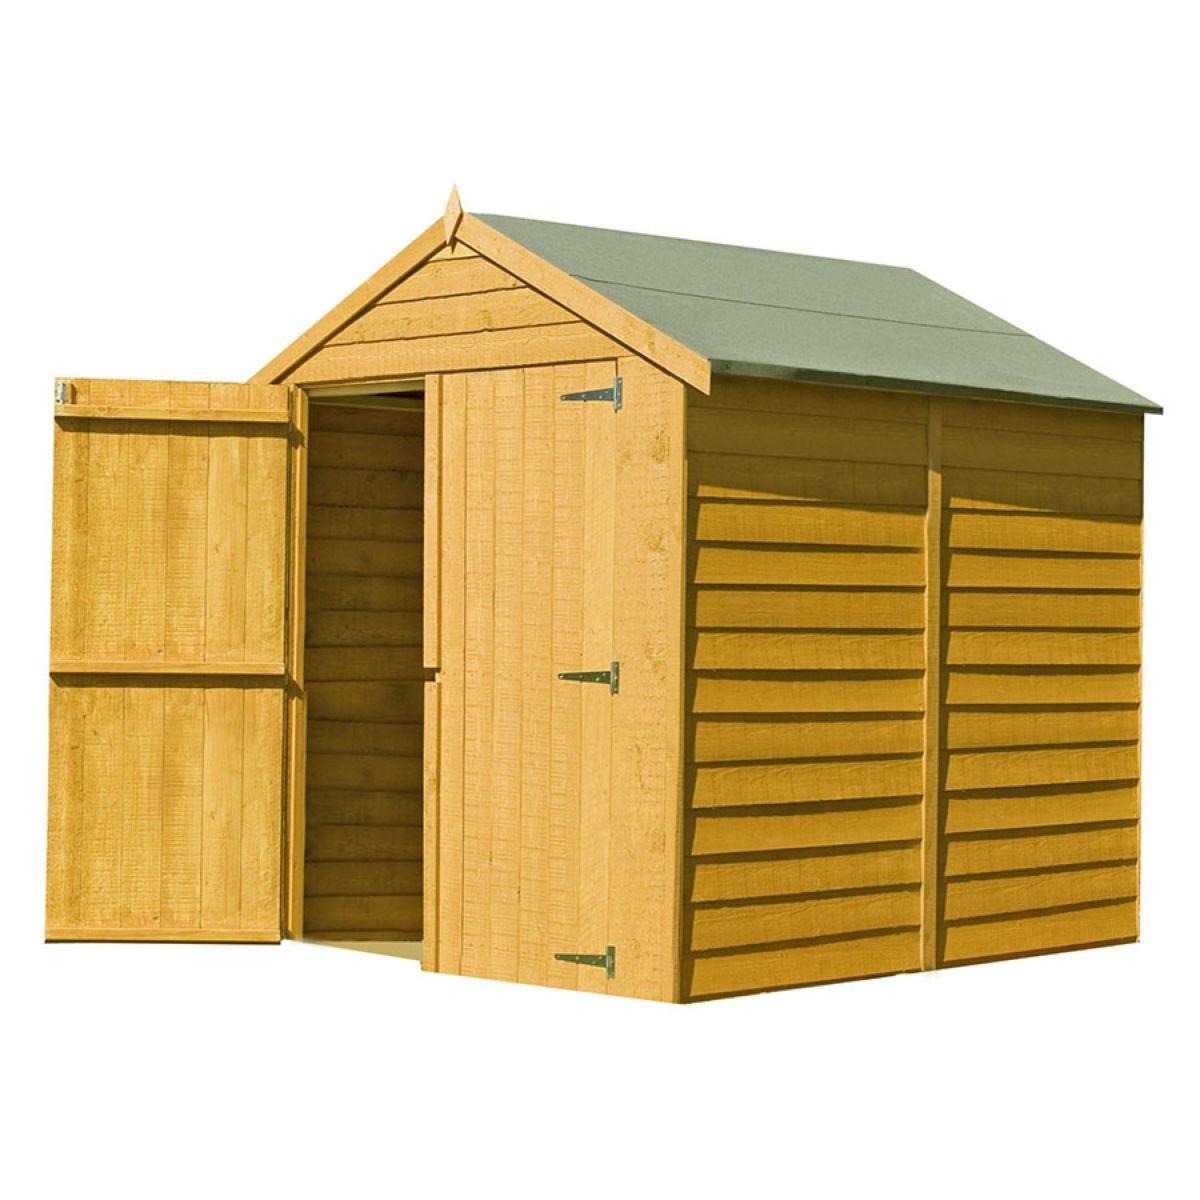 Shire Overlap 6ft X 6ft Wooden Apex Garden Shed Robert Dyas